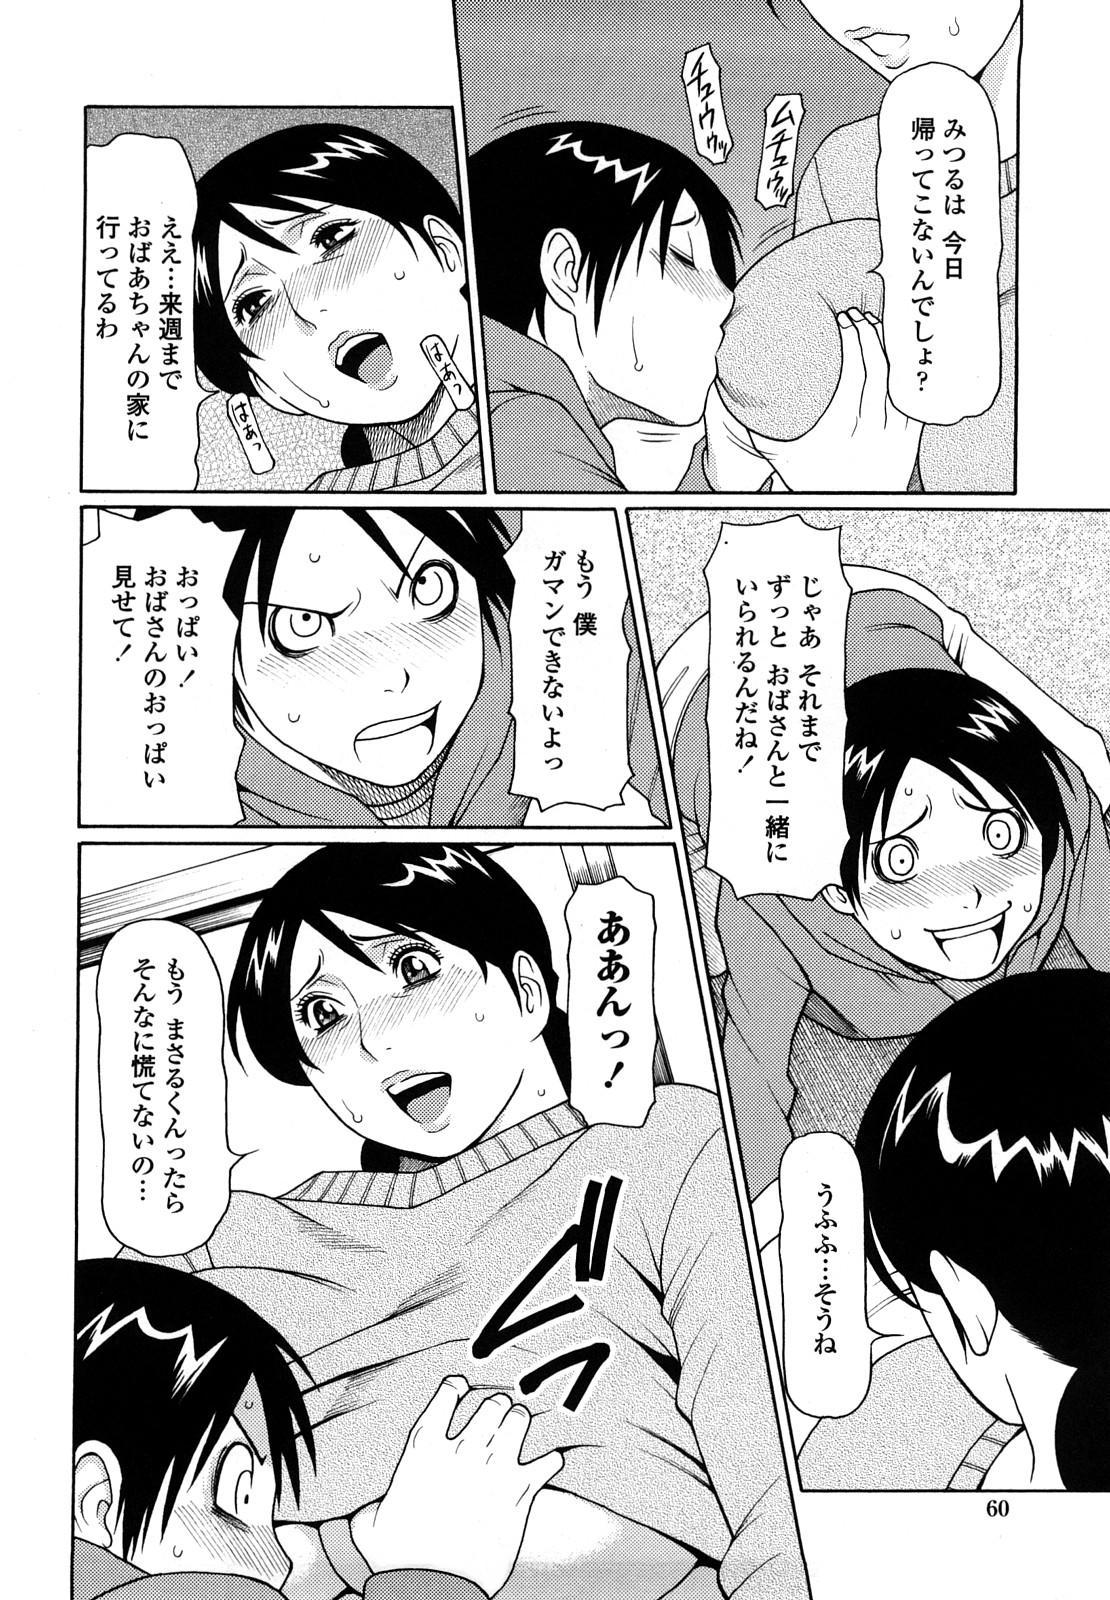 [Takasugi Kou] Kindan no Haha-Ana - Immorality Love-Hole [Decensored] 61